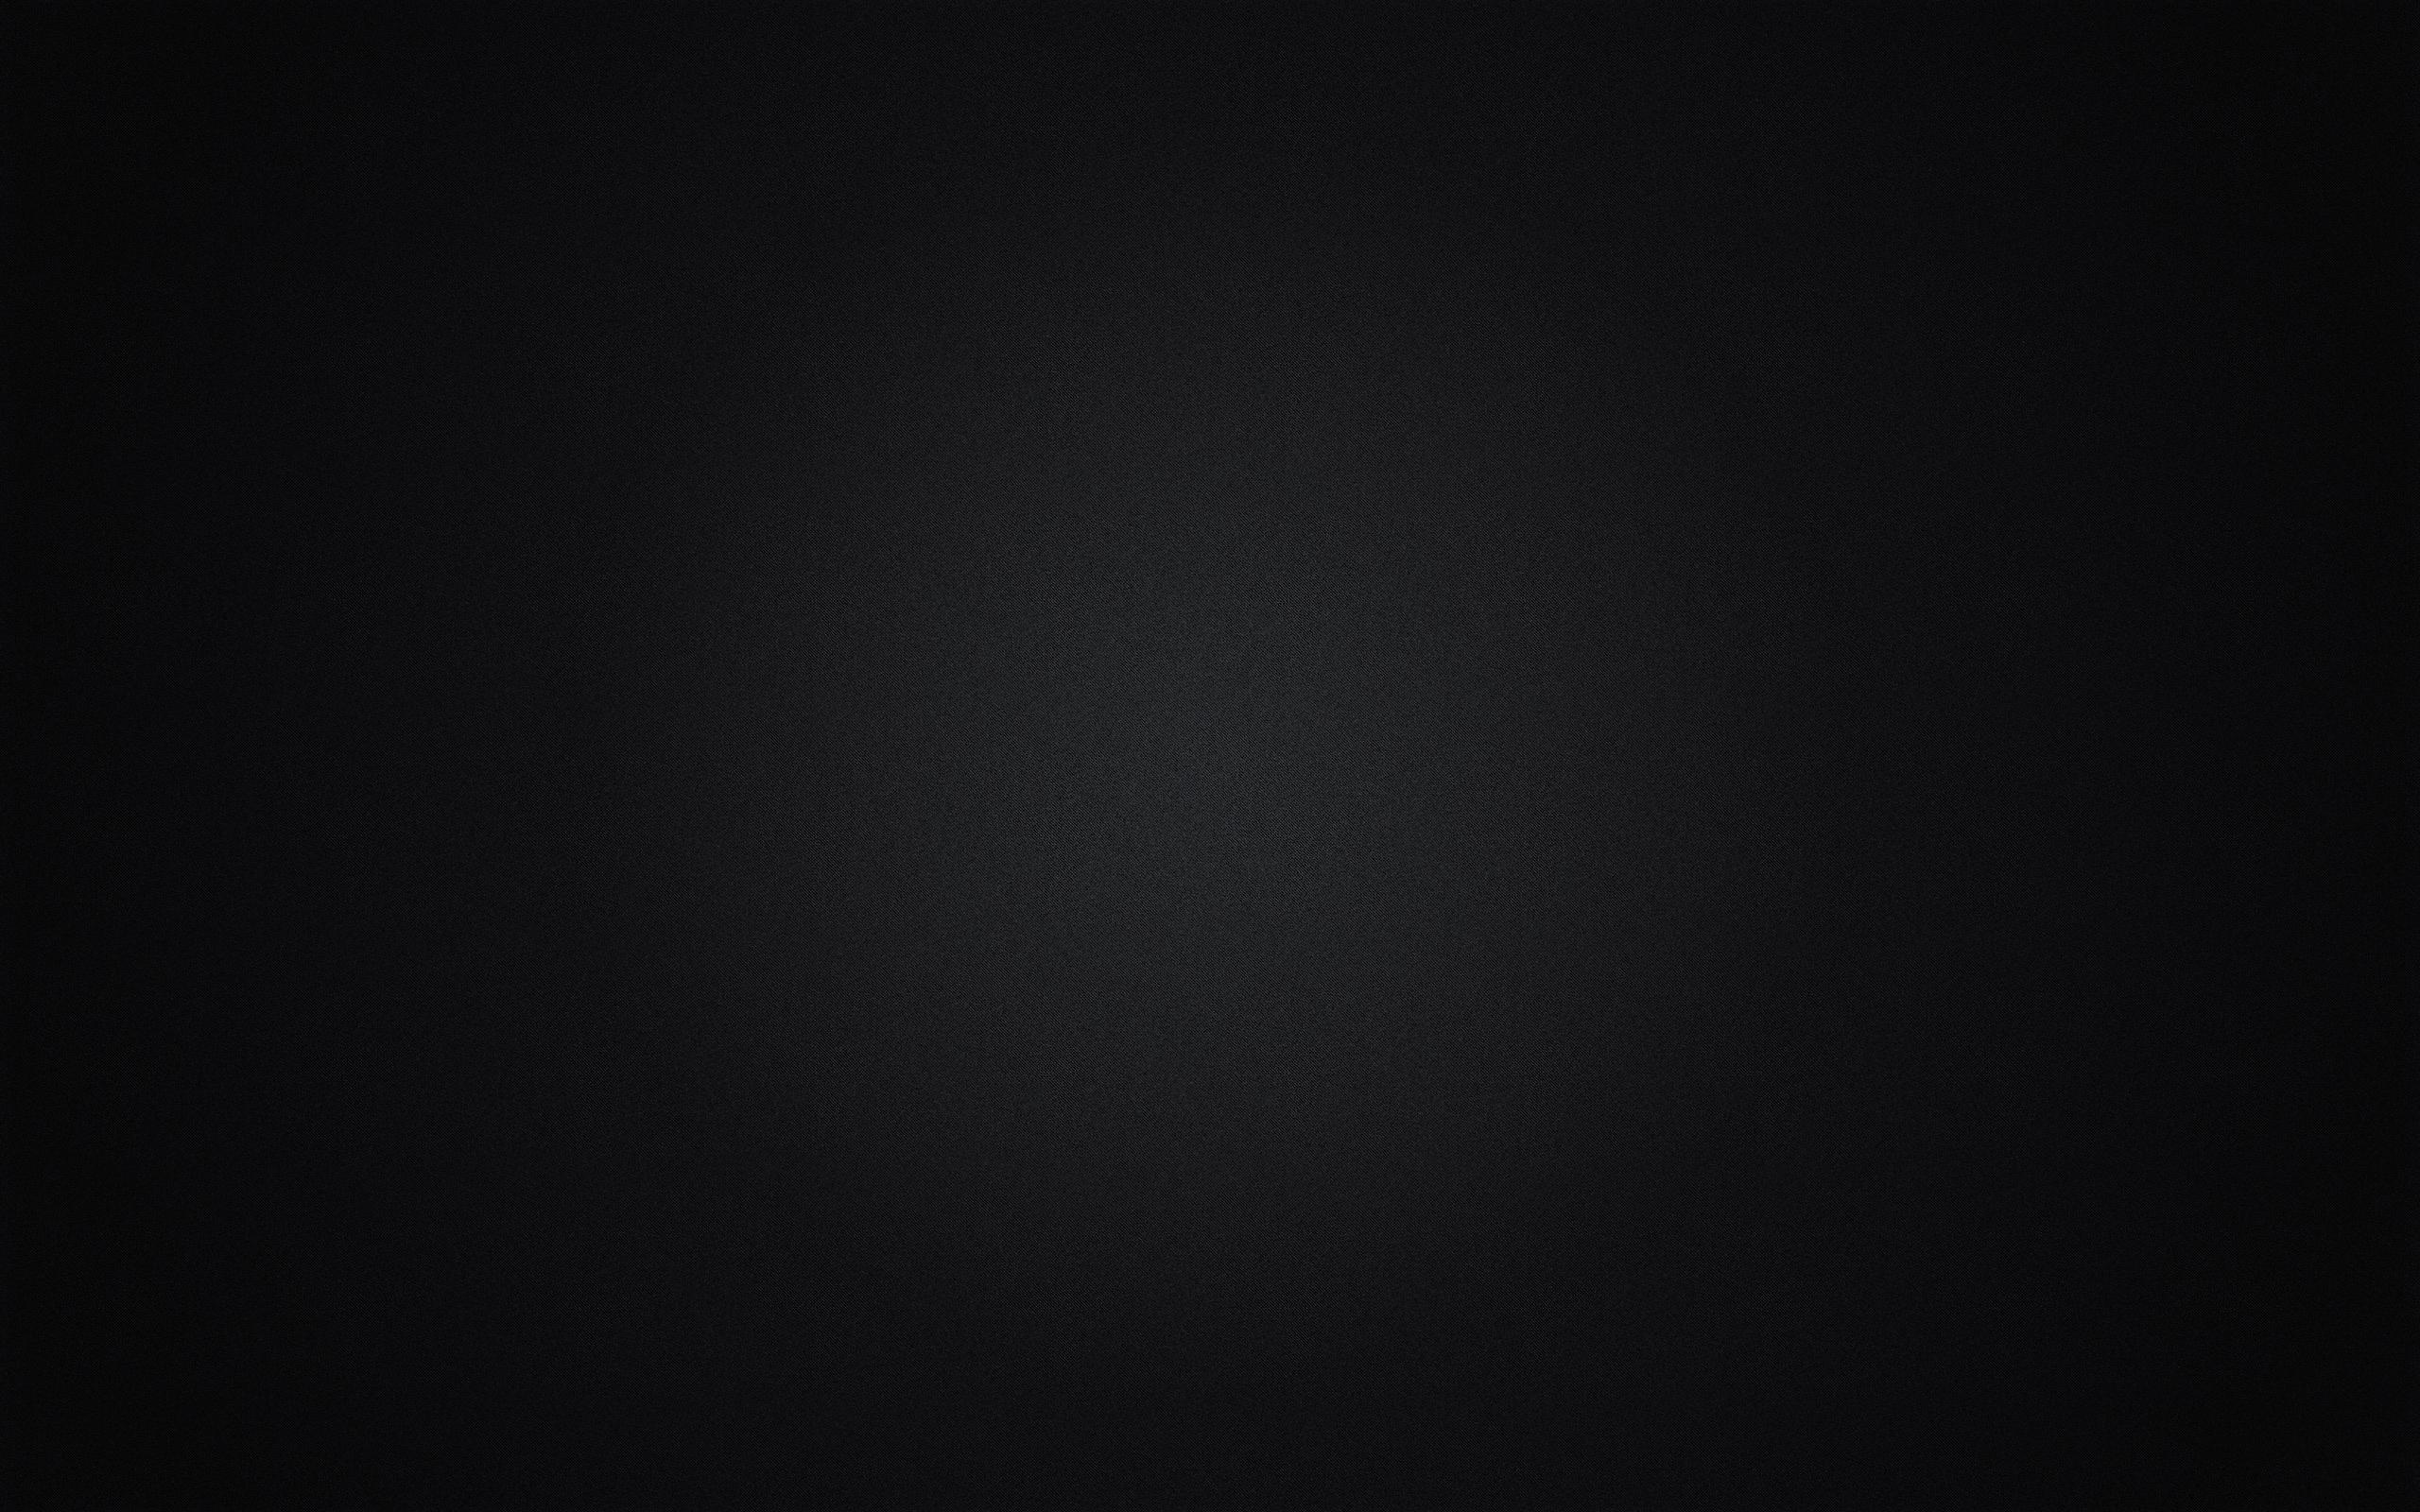 black backgrounds 18252